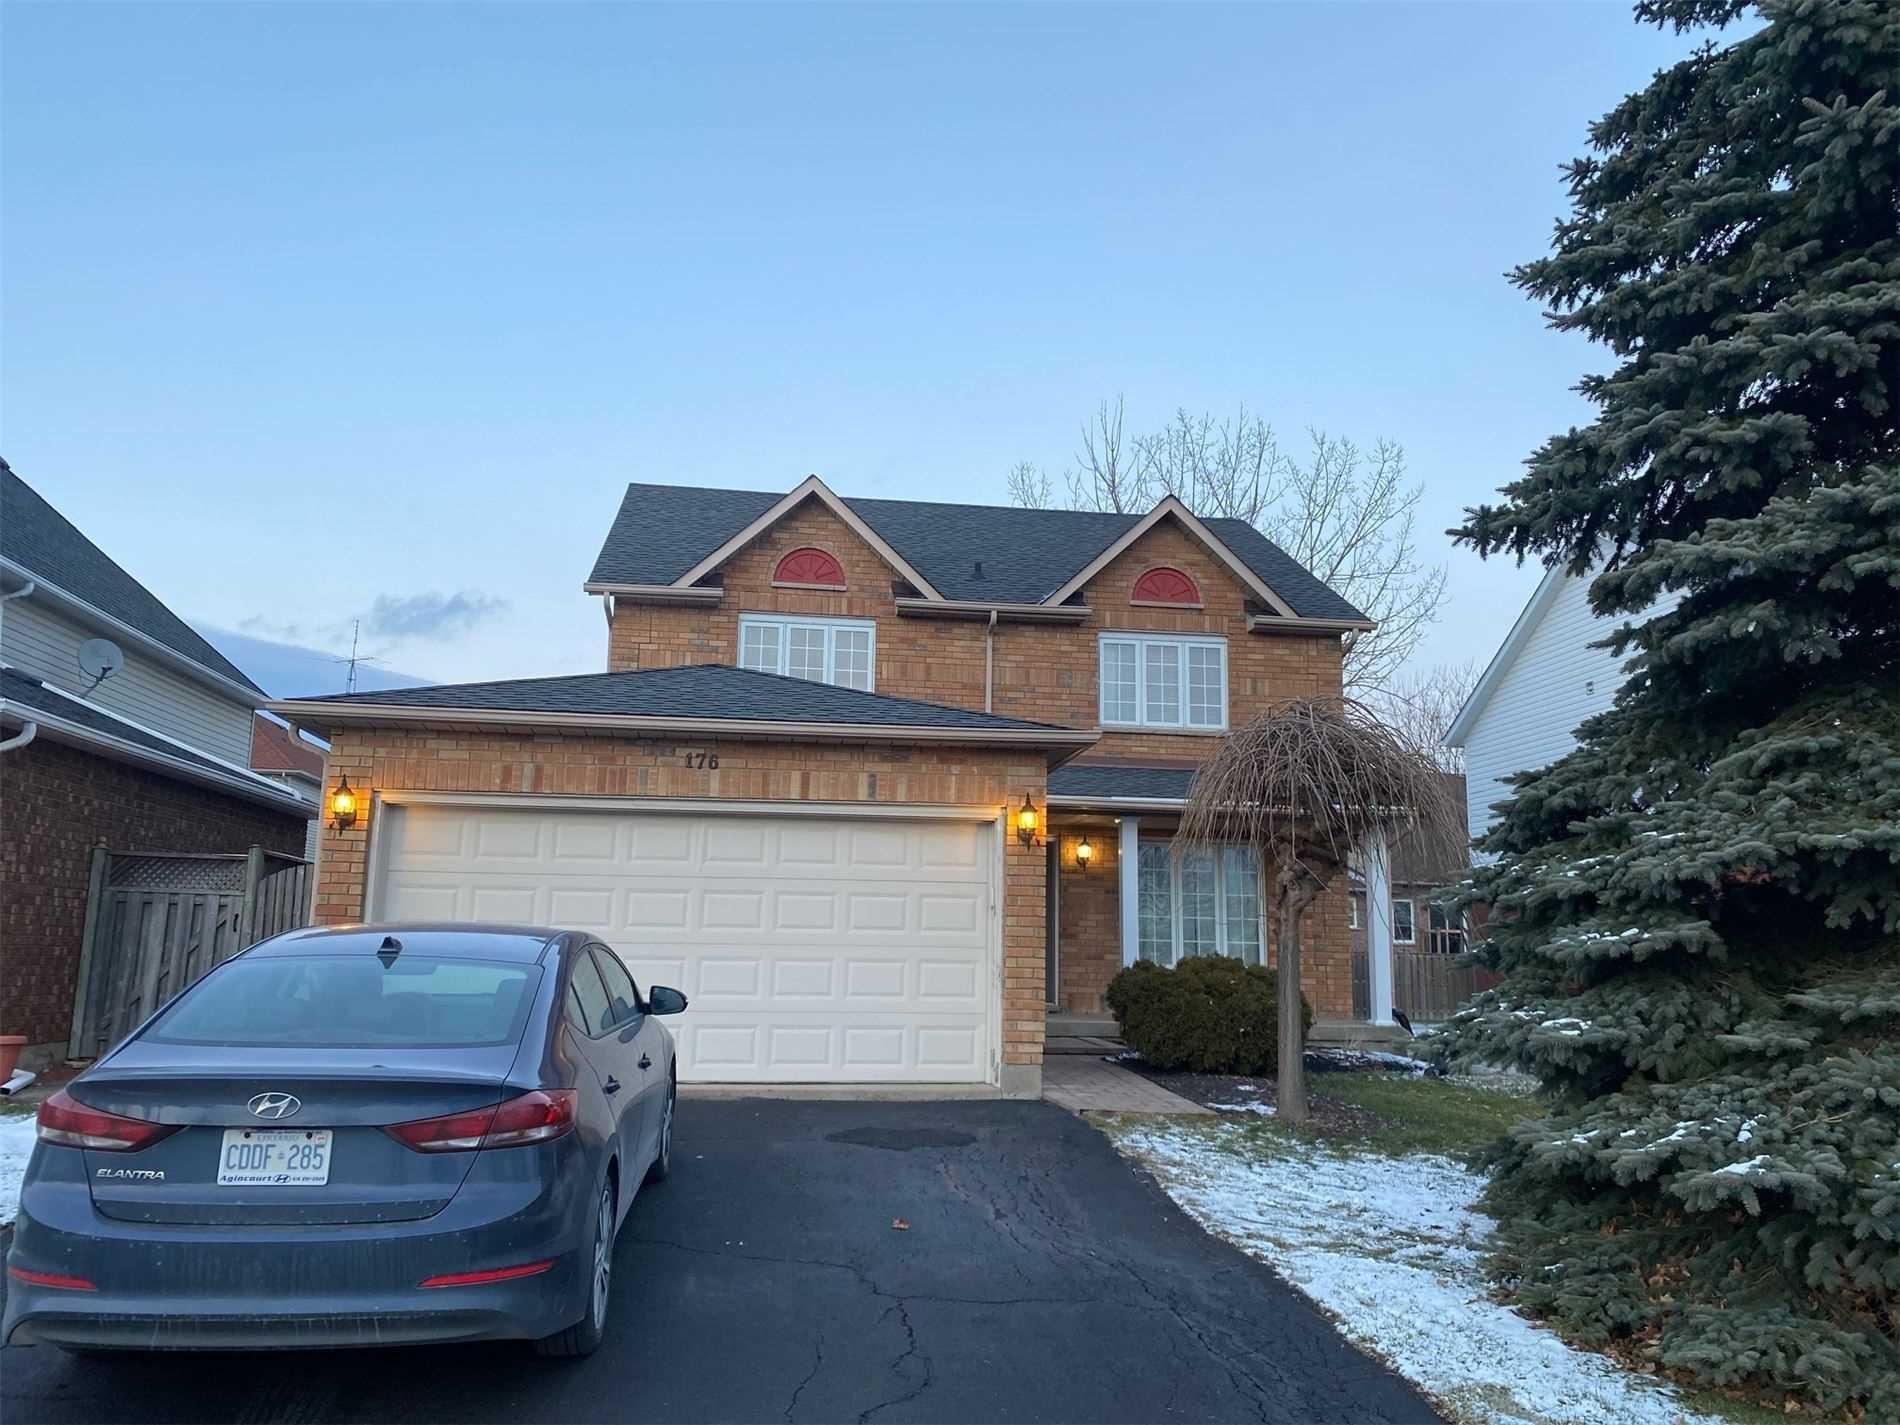 176 Confederation Ave, Thorold, Ontario L2V 5A6, 4 Bedrooms Bedrooms, ,3 BathroomsBathrooms,Detached,For Lease,Confederation,X5166159